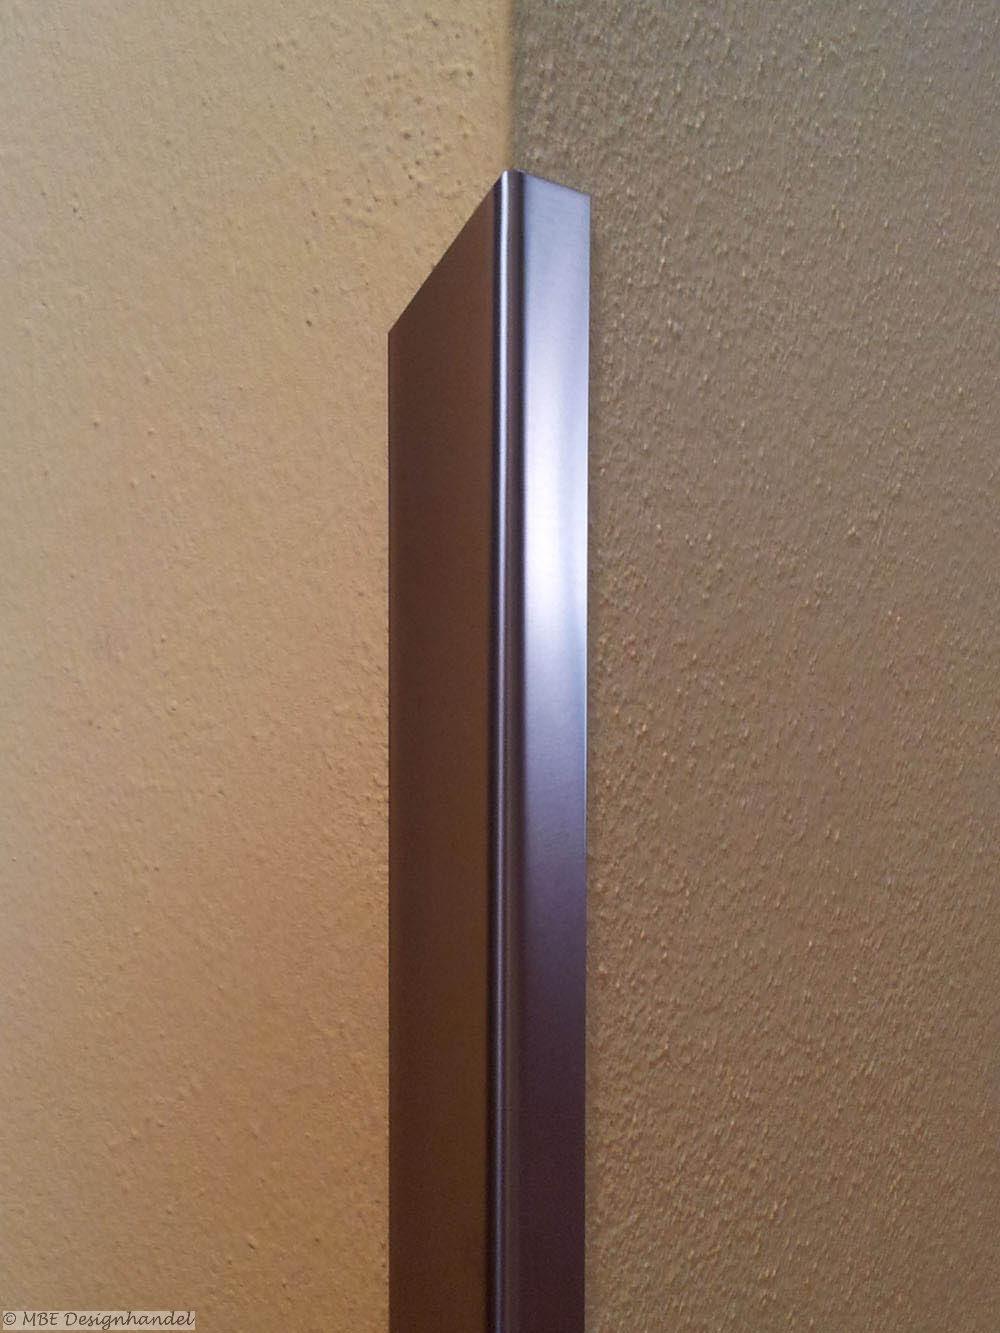 kantenschutz 40x40x1250mm 1 0mm edelstahl halbspitz links. Black Bedroom Furniture Sets. Home Design Ideas